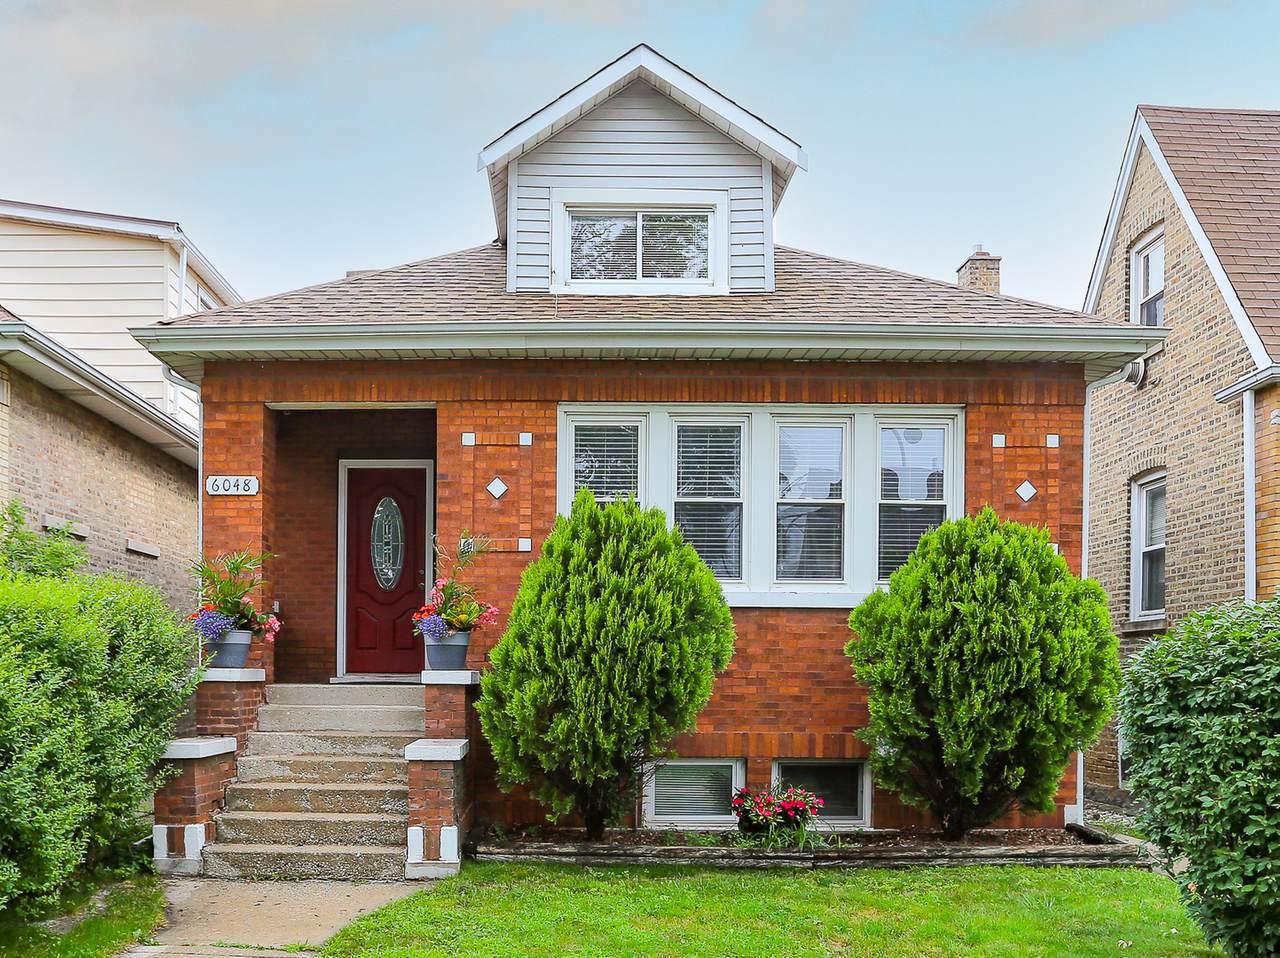 6048 Wellington Avenue - Photo 1